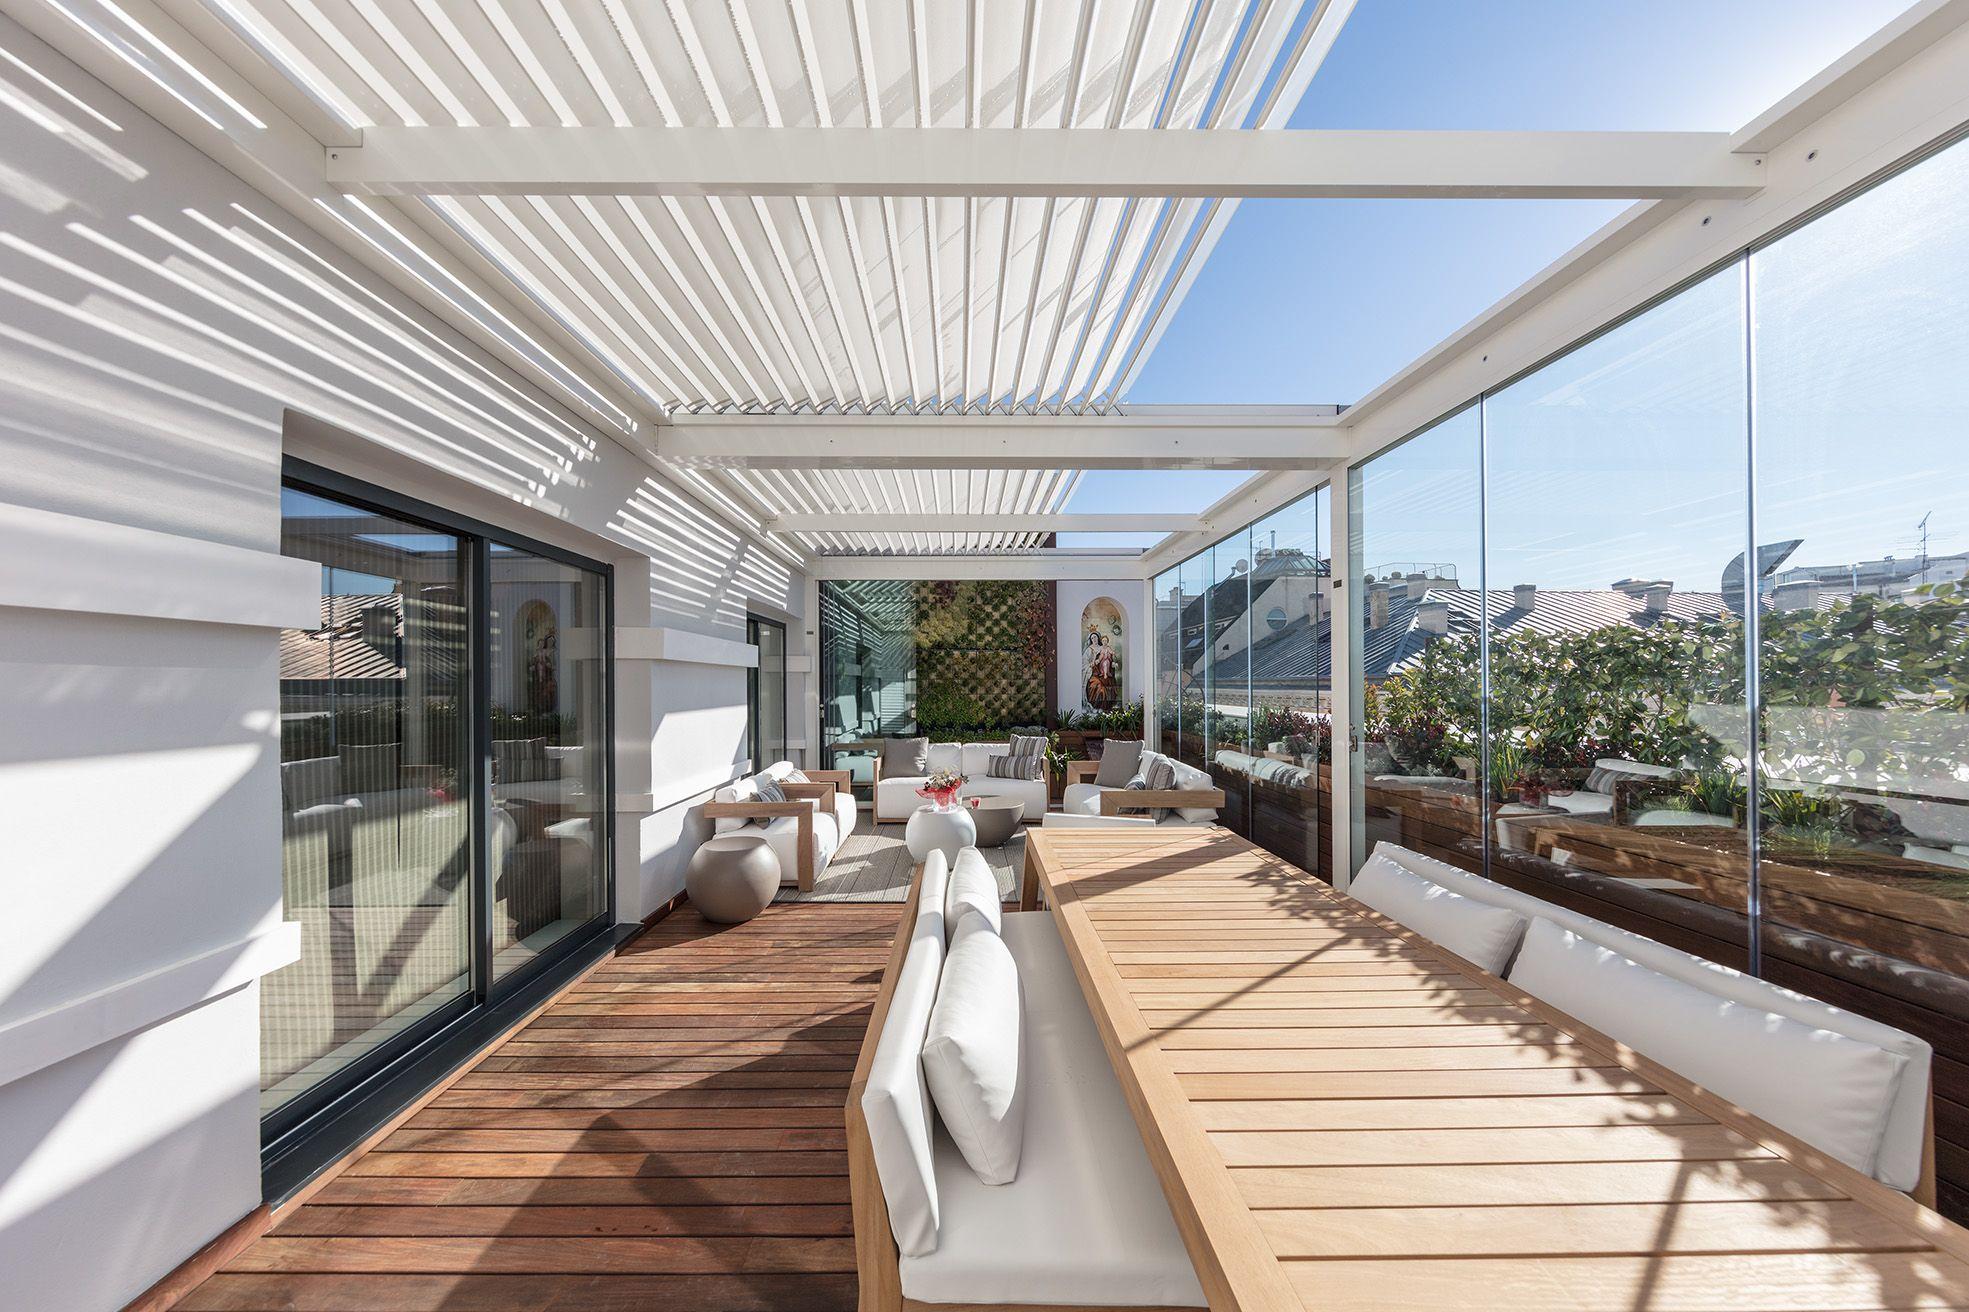 terraza con prgola bioclimtica - Pergola Terraza